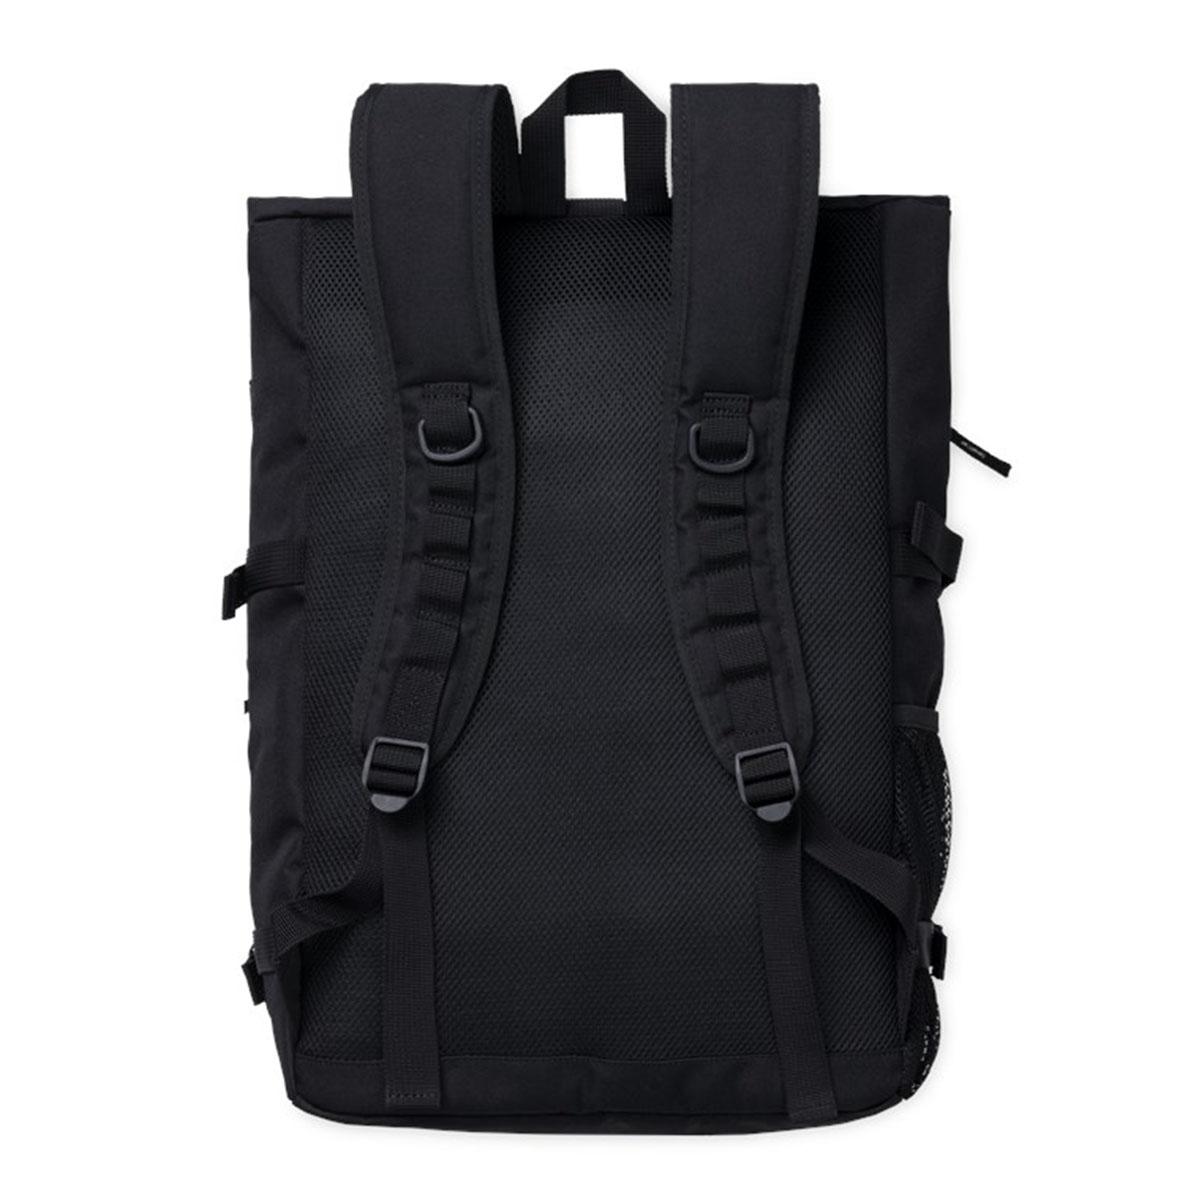 Carhartt WIP Phillis Backpack